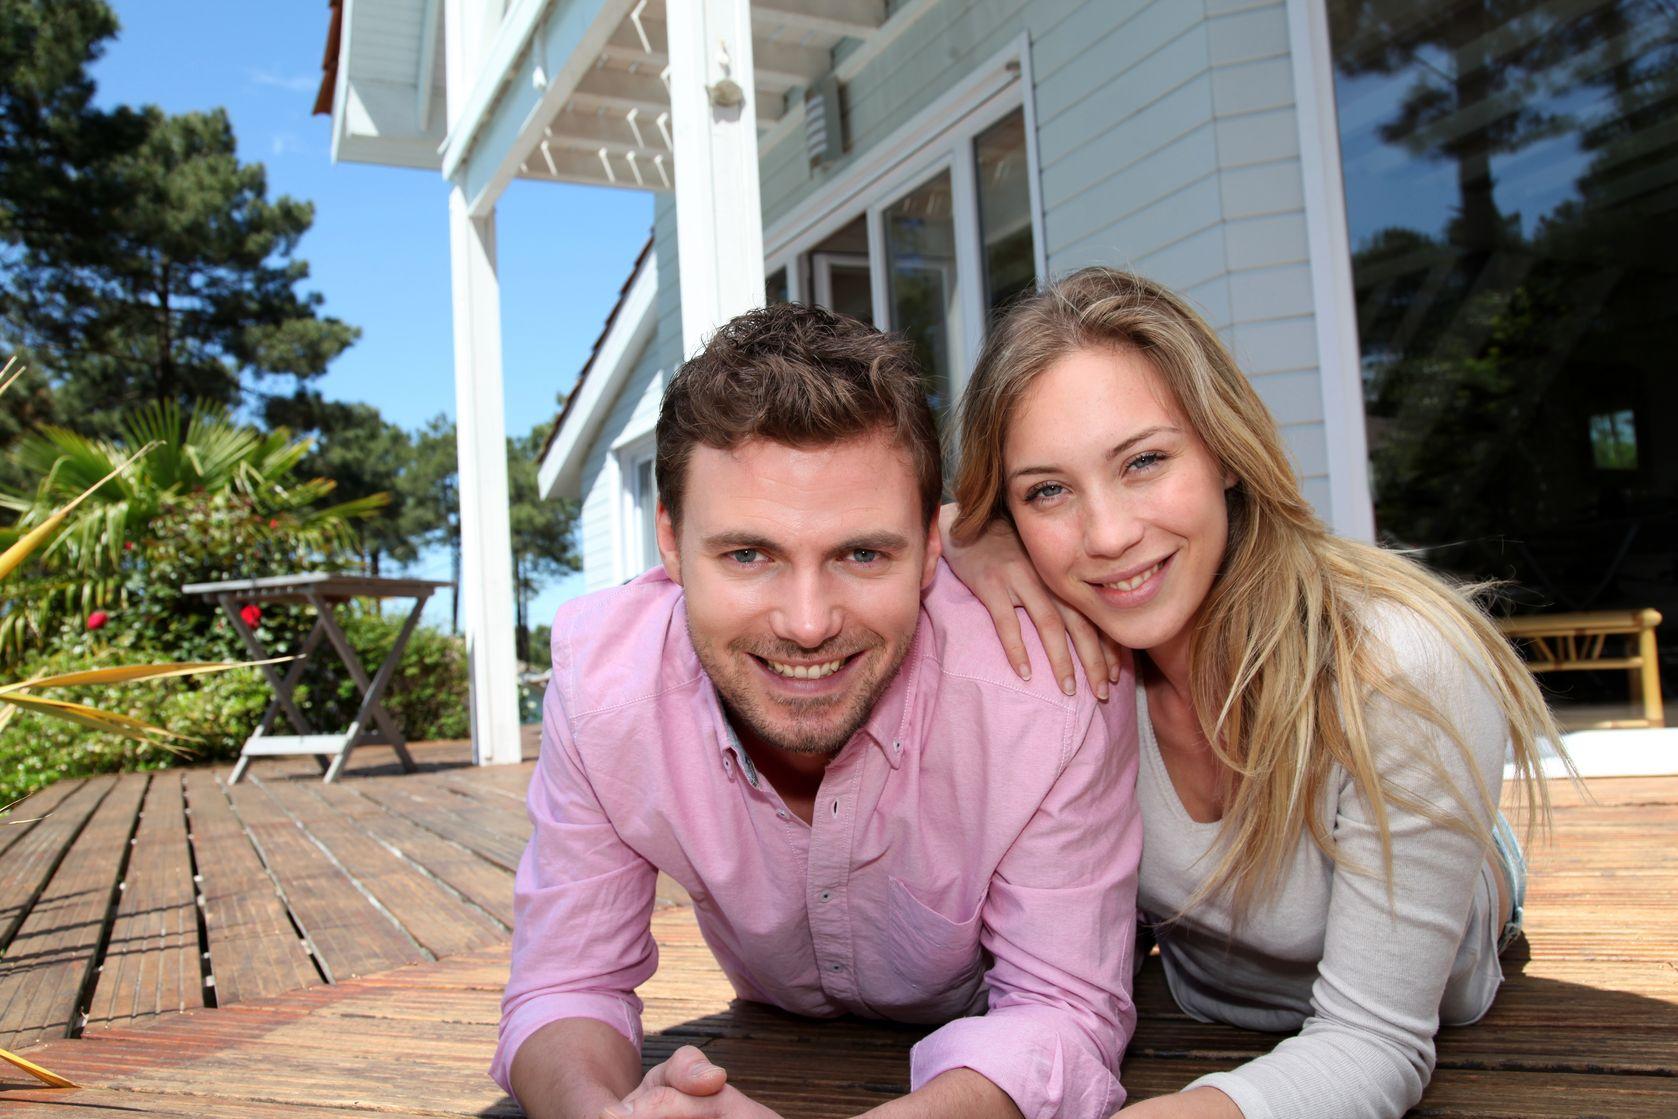 Assicurazione per te preventivo assicurazione casa e famiglia axa assirin - Assicurazione per le casalinghe ...